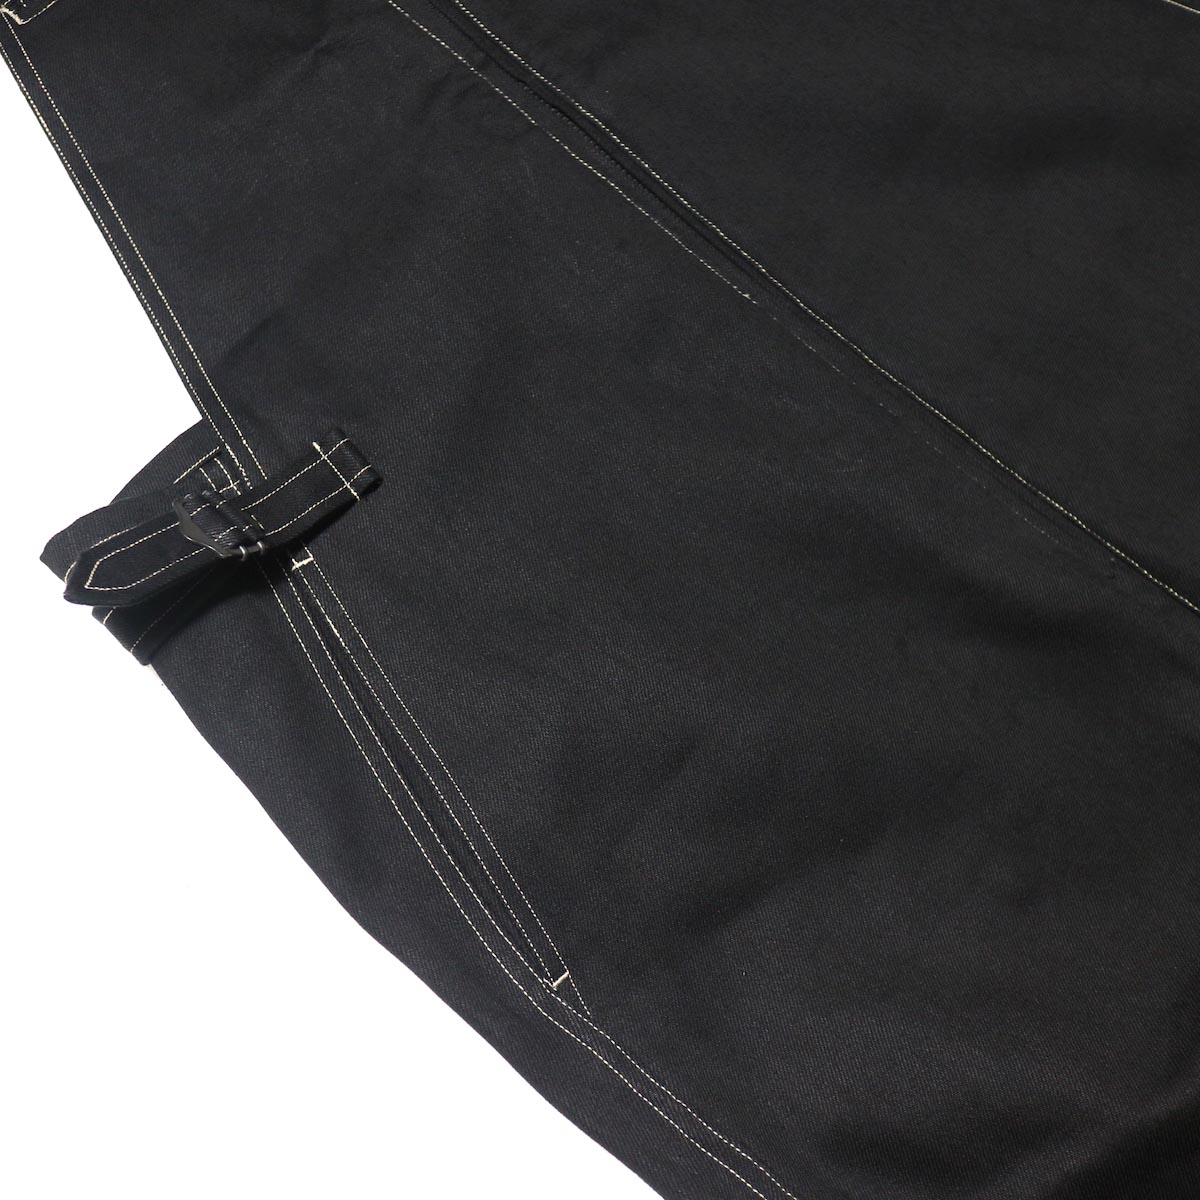 blurhms / U.S Cotton Denim Overalls (Black)アジャスター、ポケット